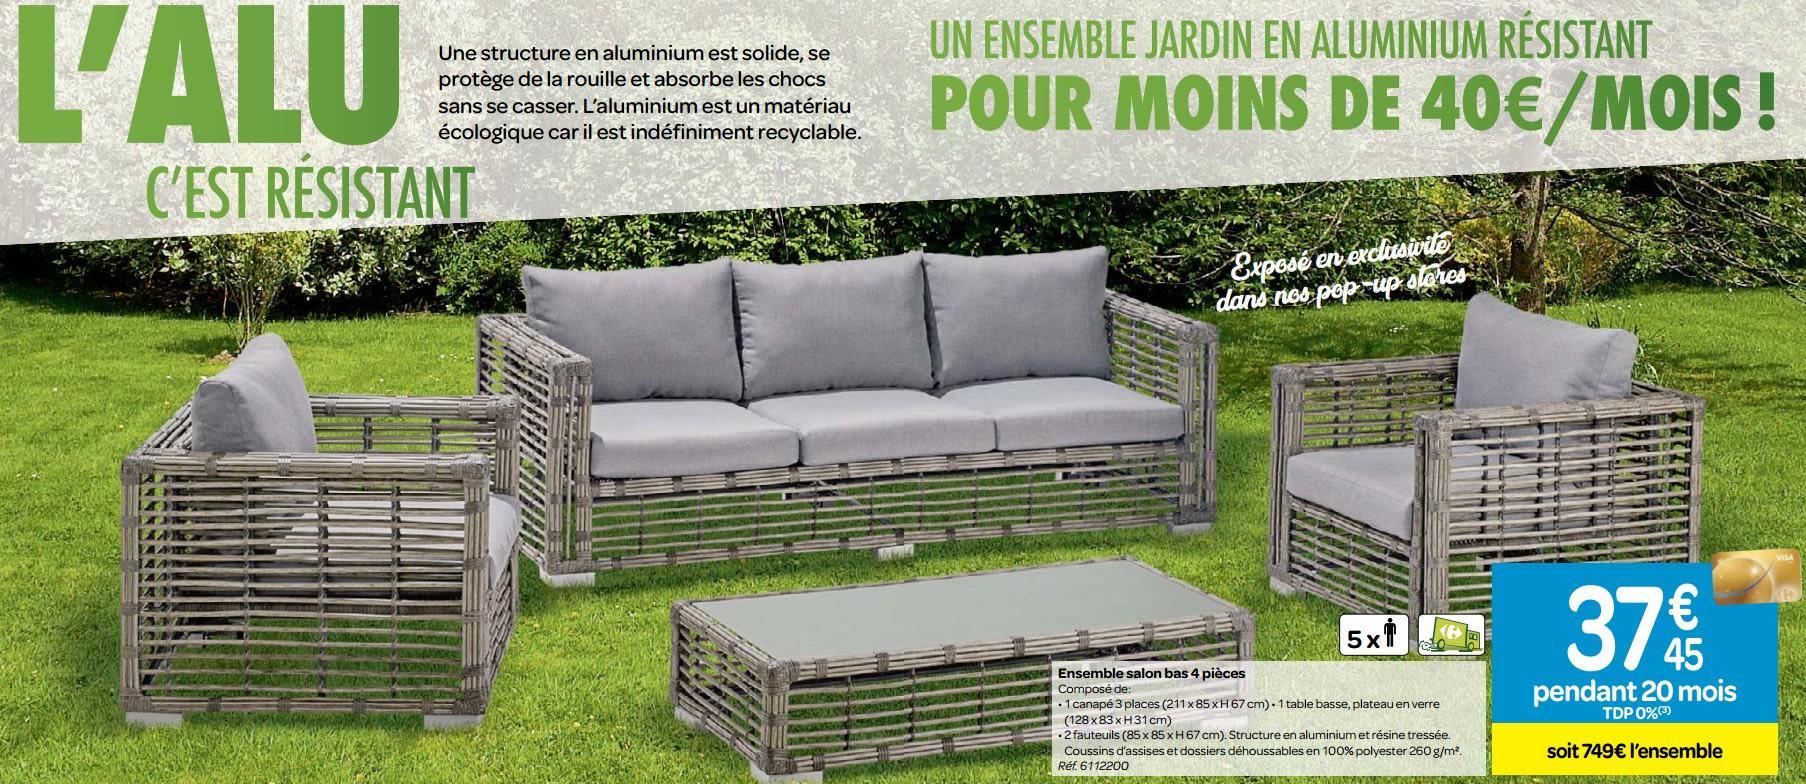 Serre De Jardin Carrefour - Canalcncarauca tout Salon De Jardin En Résine Tressée Carrefour